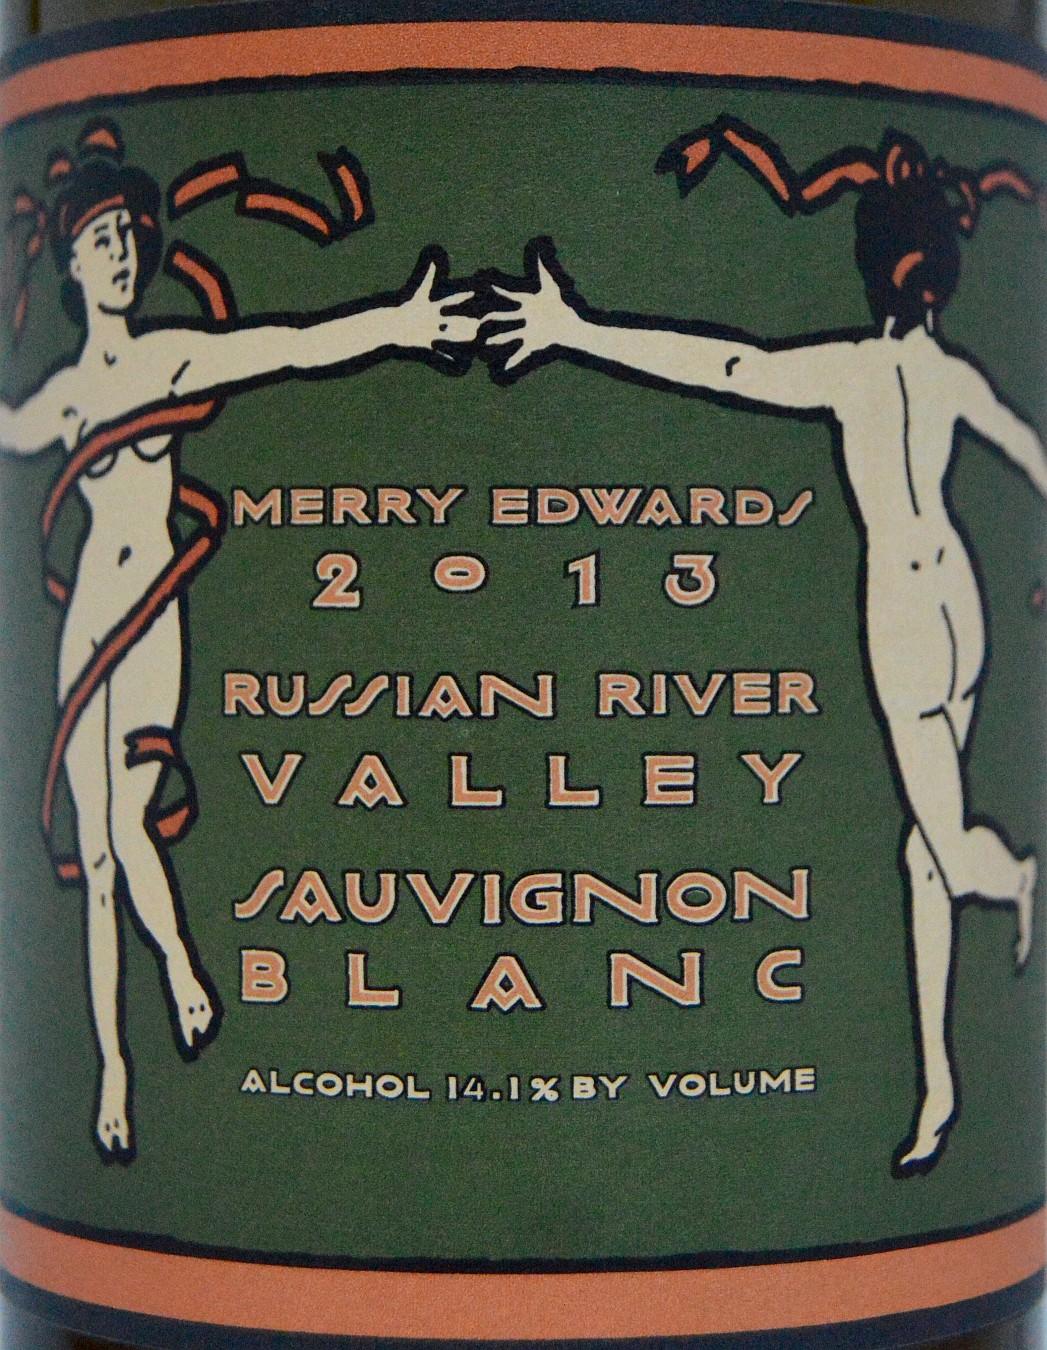 Merry Edwards Sauvignon Blanc label